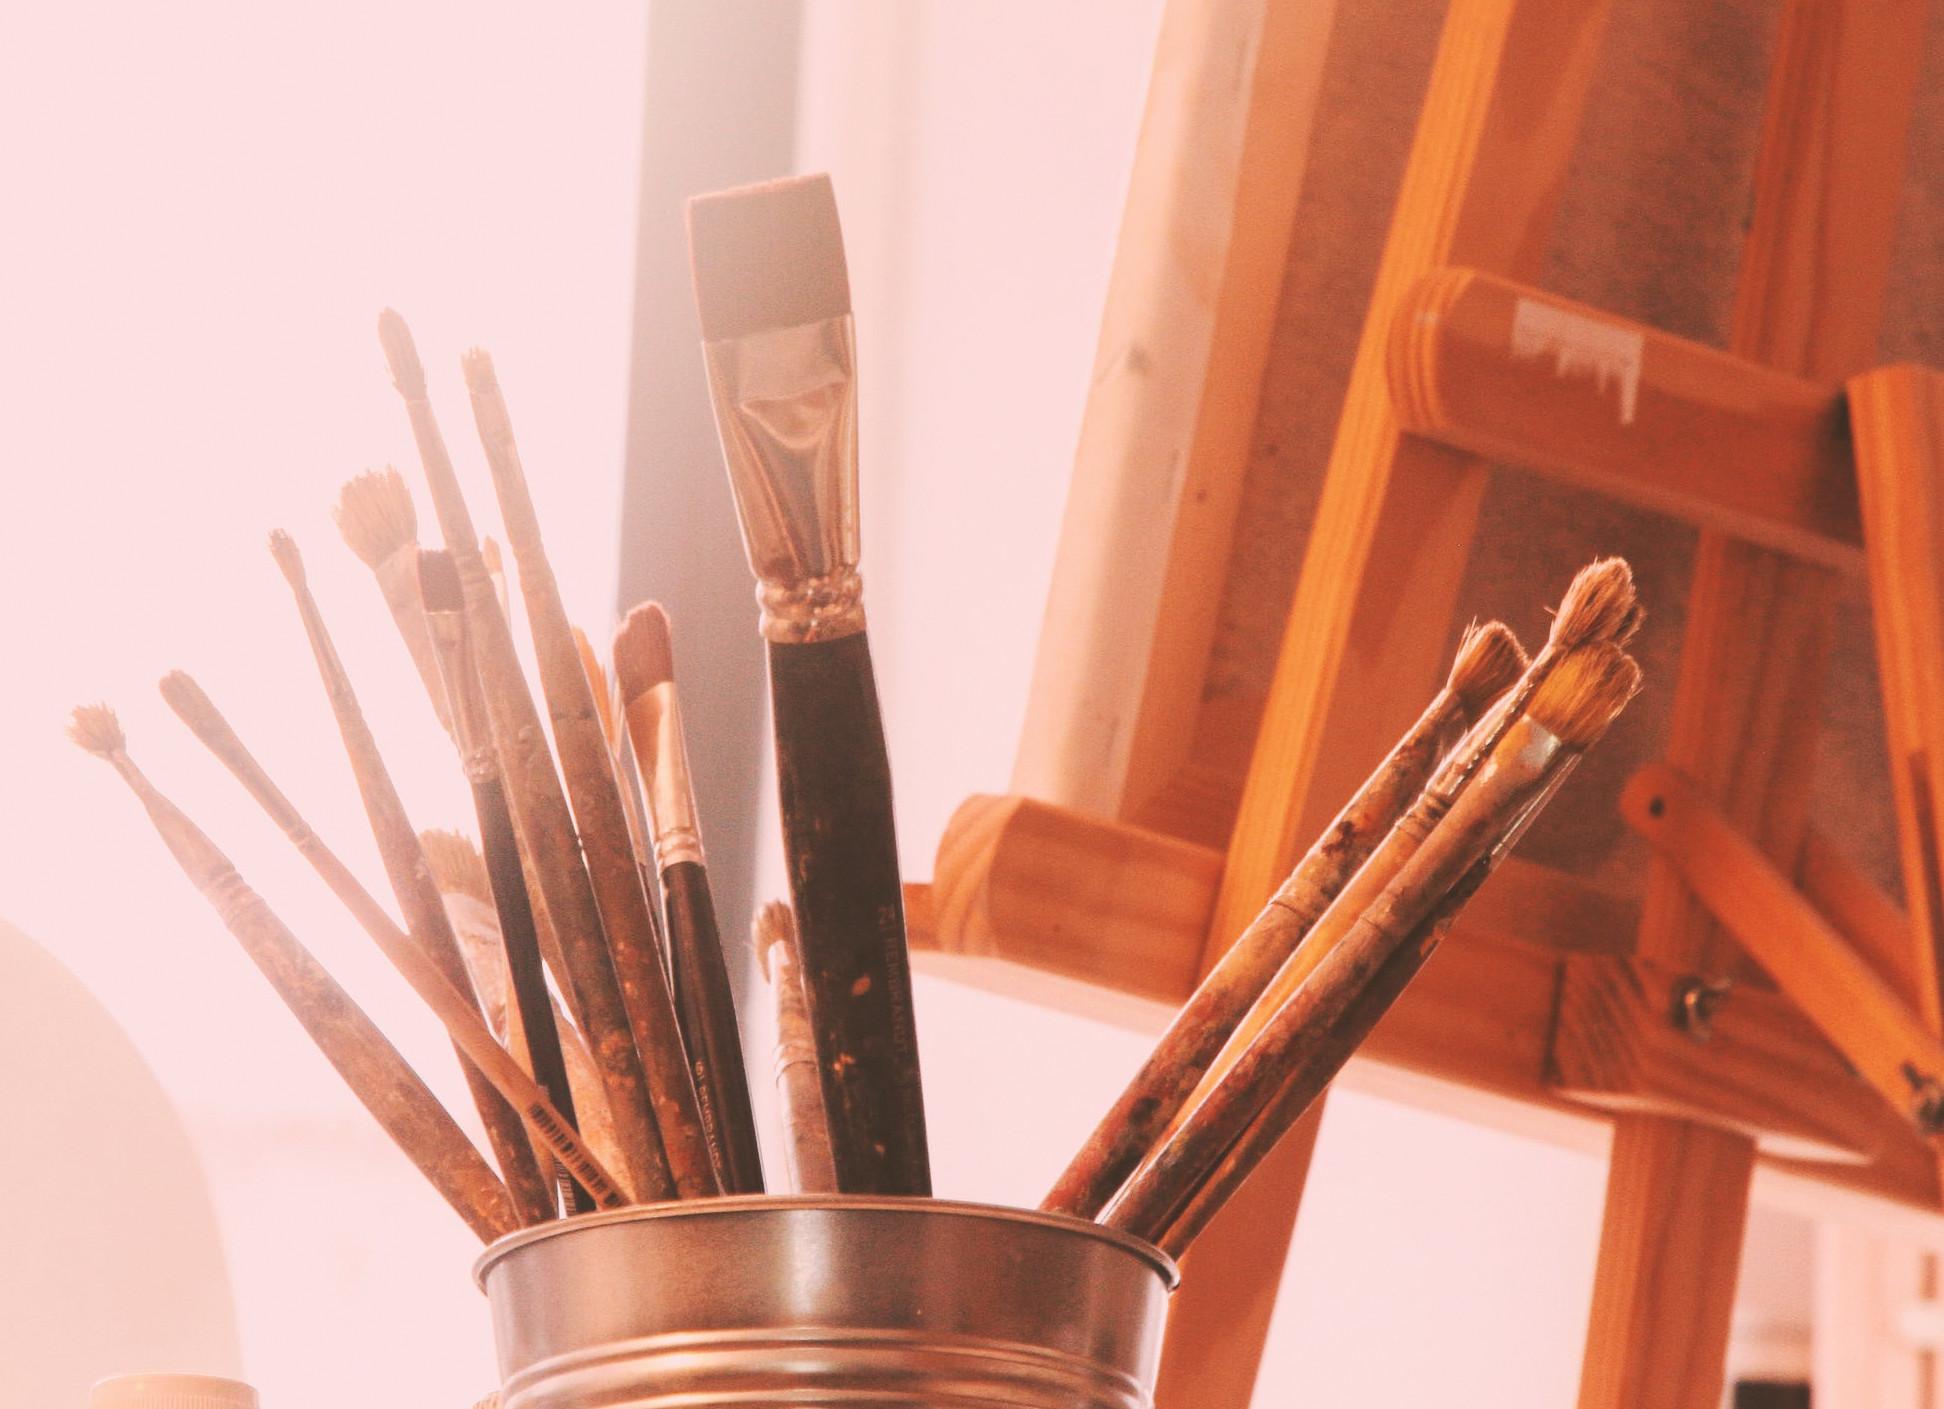 Artwork Commission Consultation